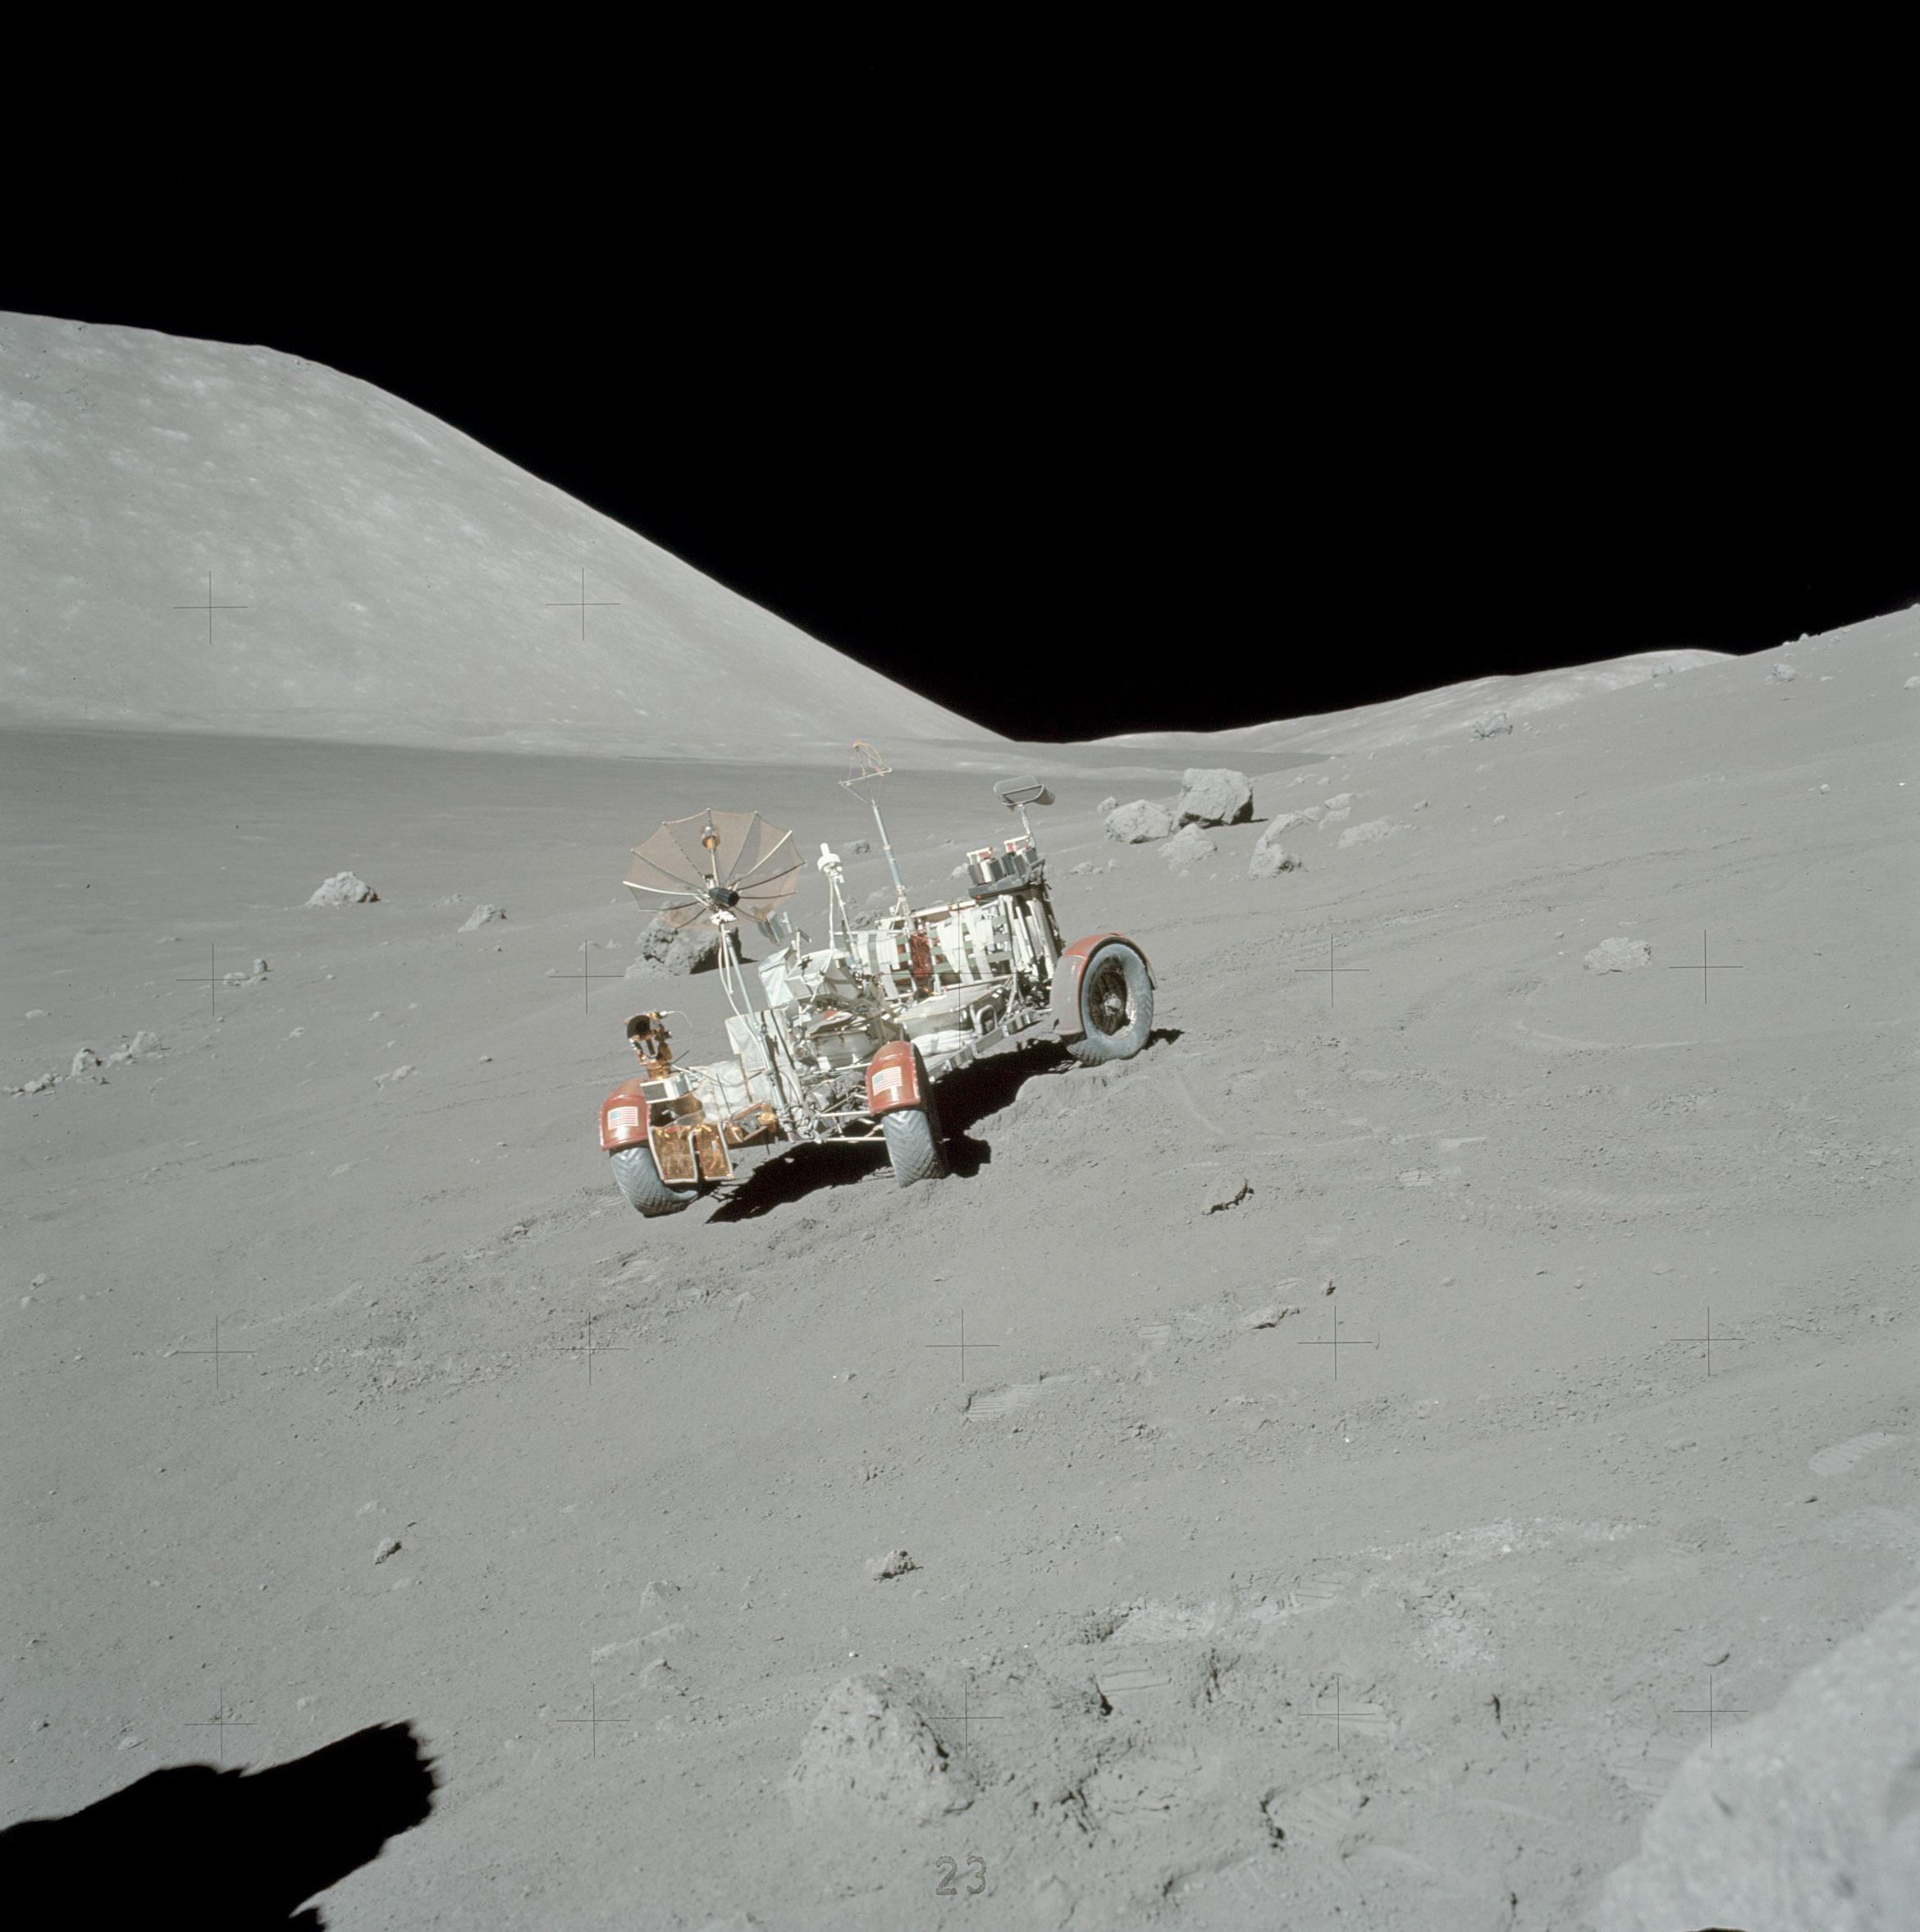 File:Apollo 17 AS17-140-21409HR.jpg